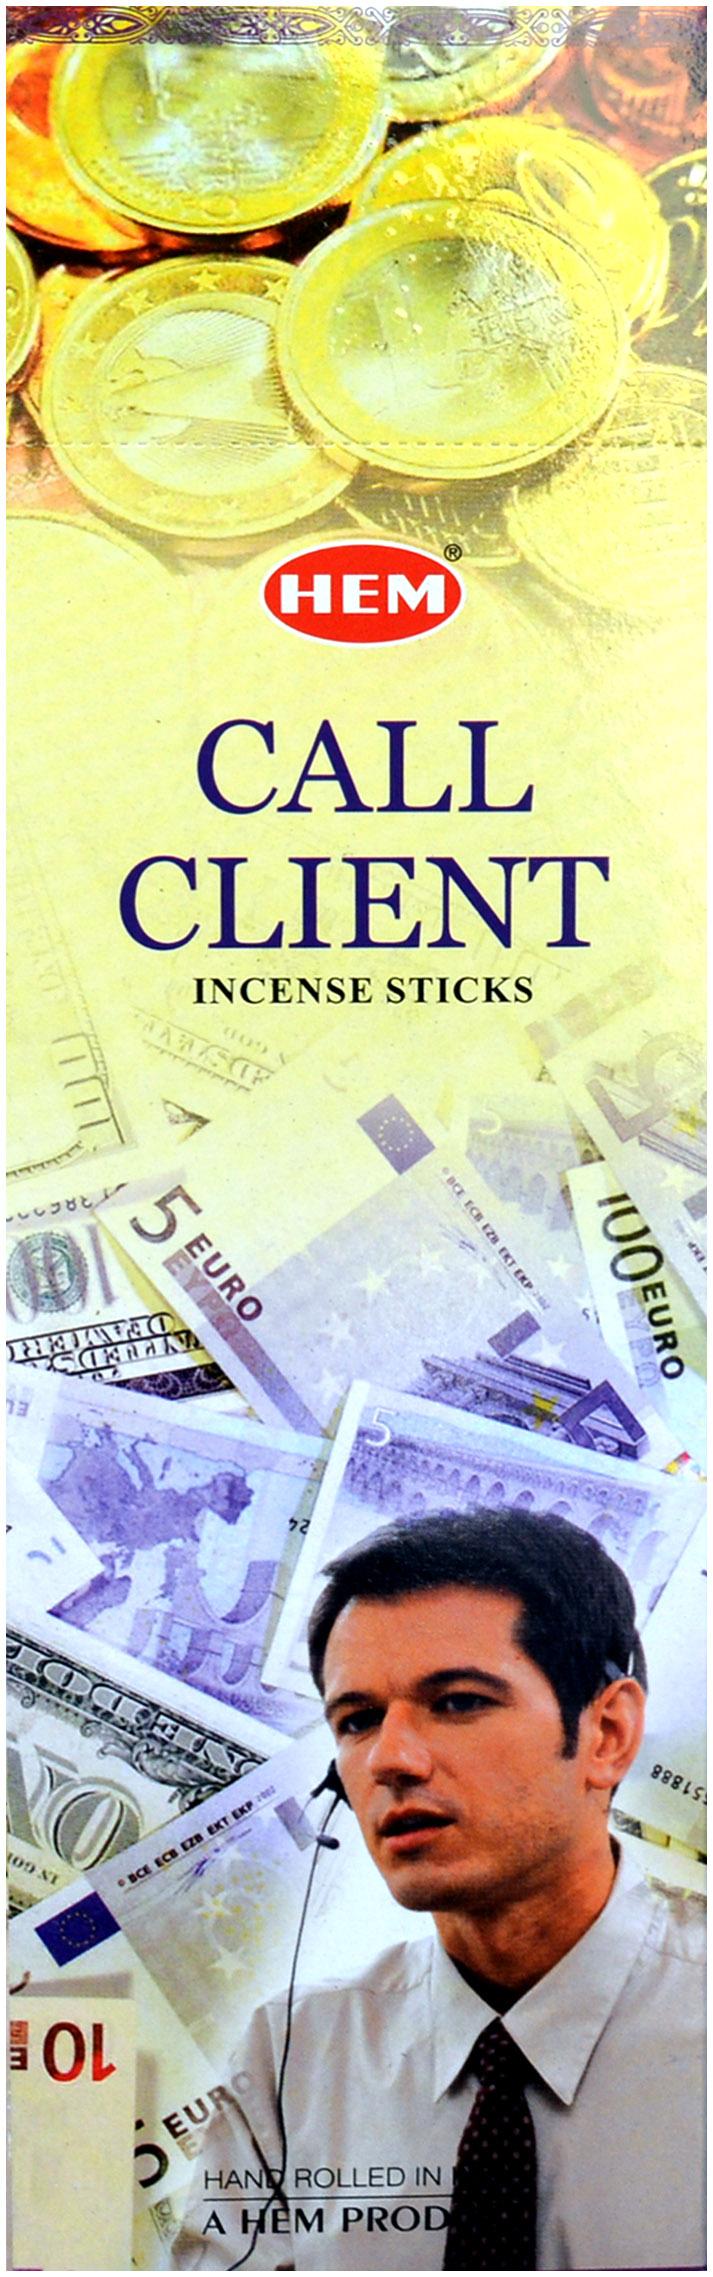 Hem incense call client 8Stks